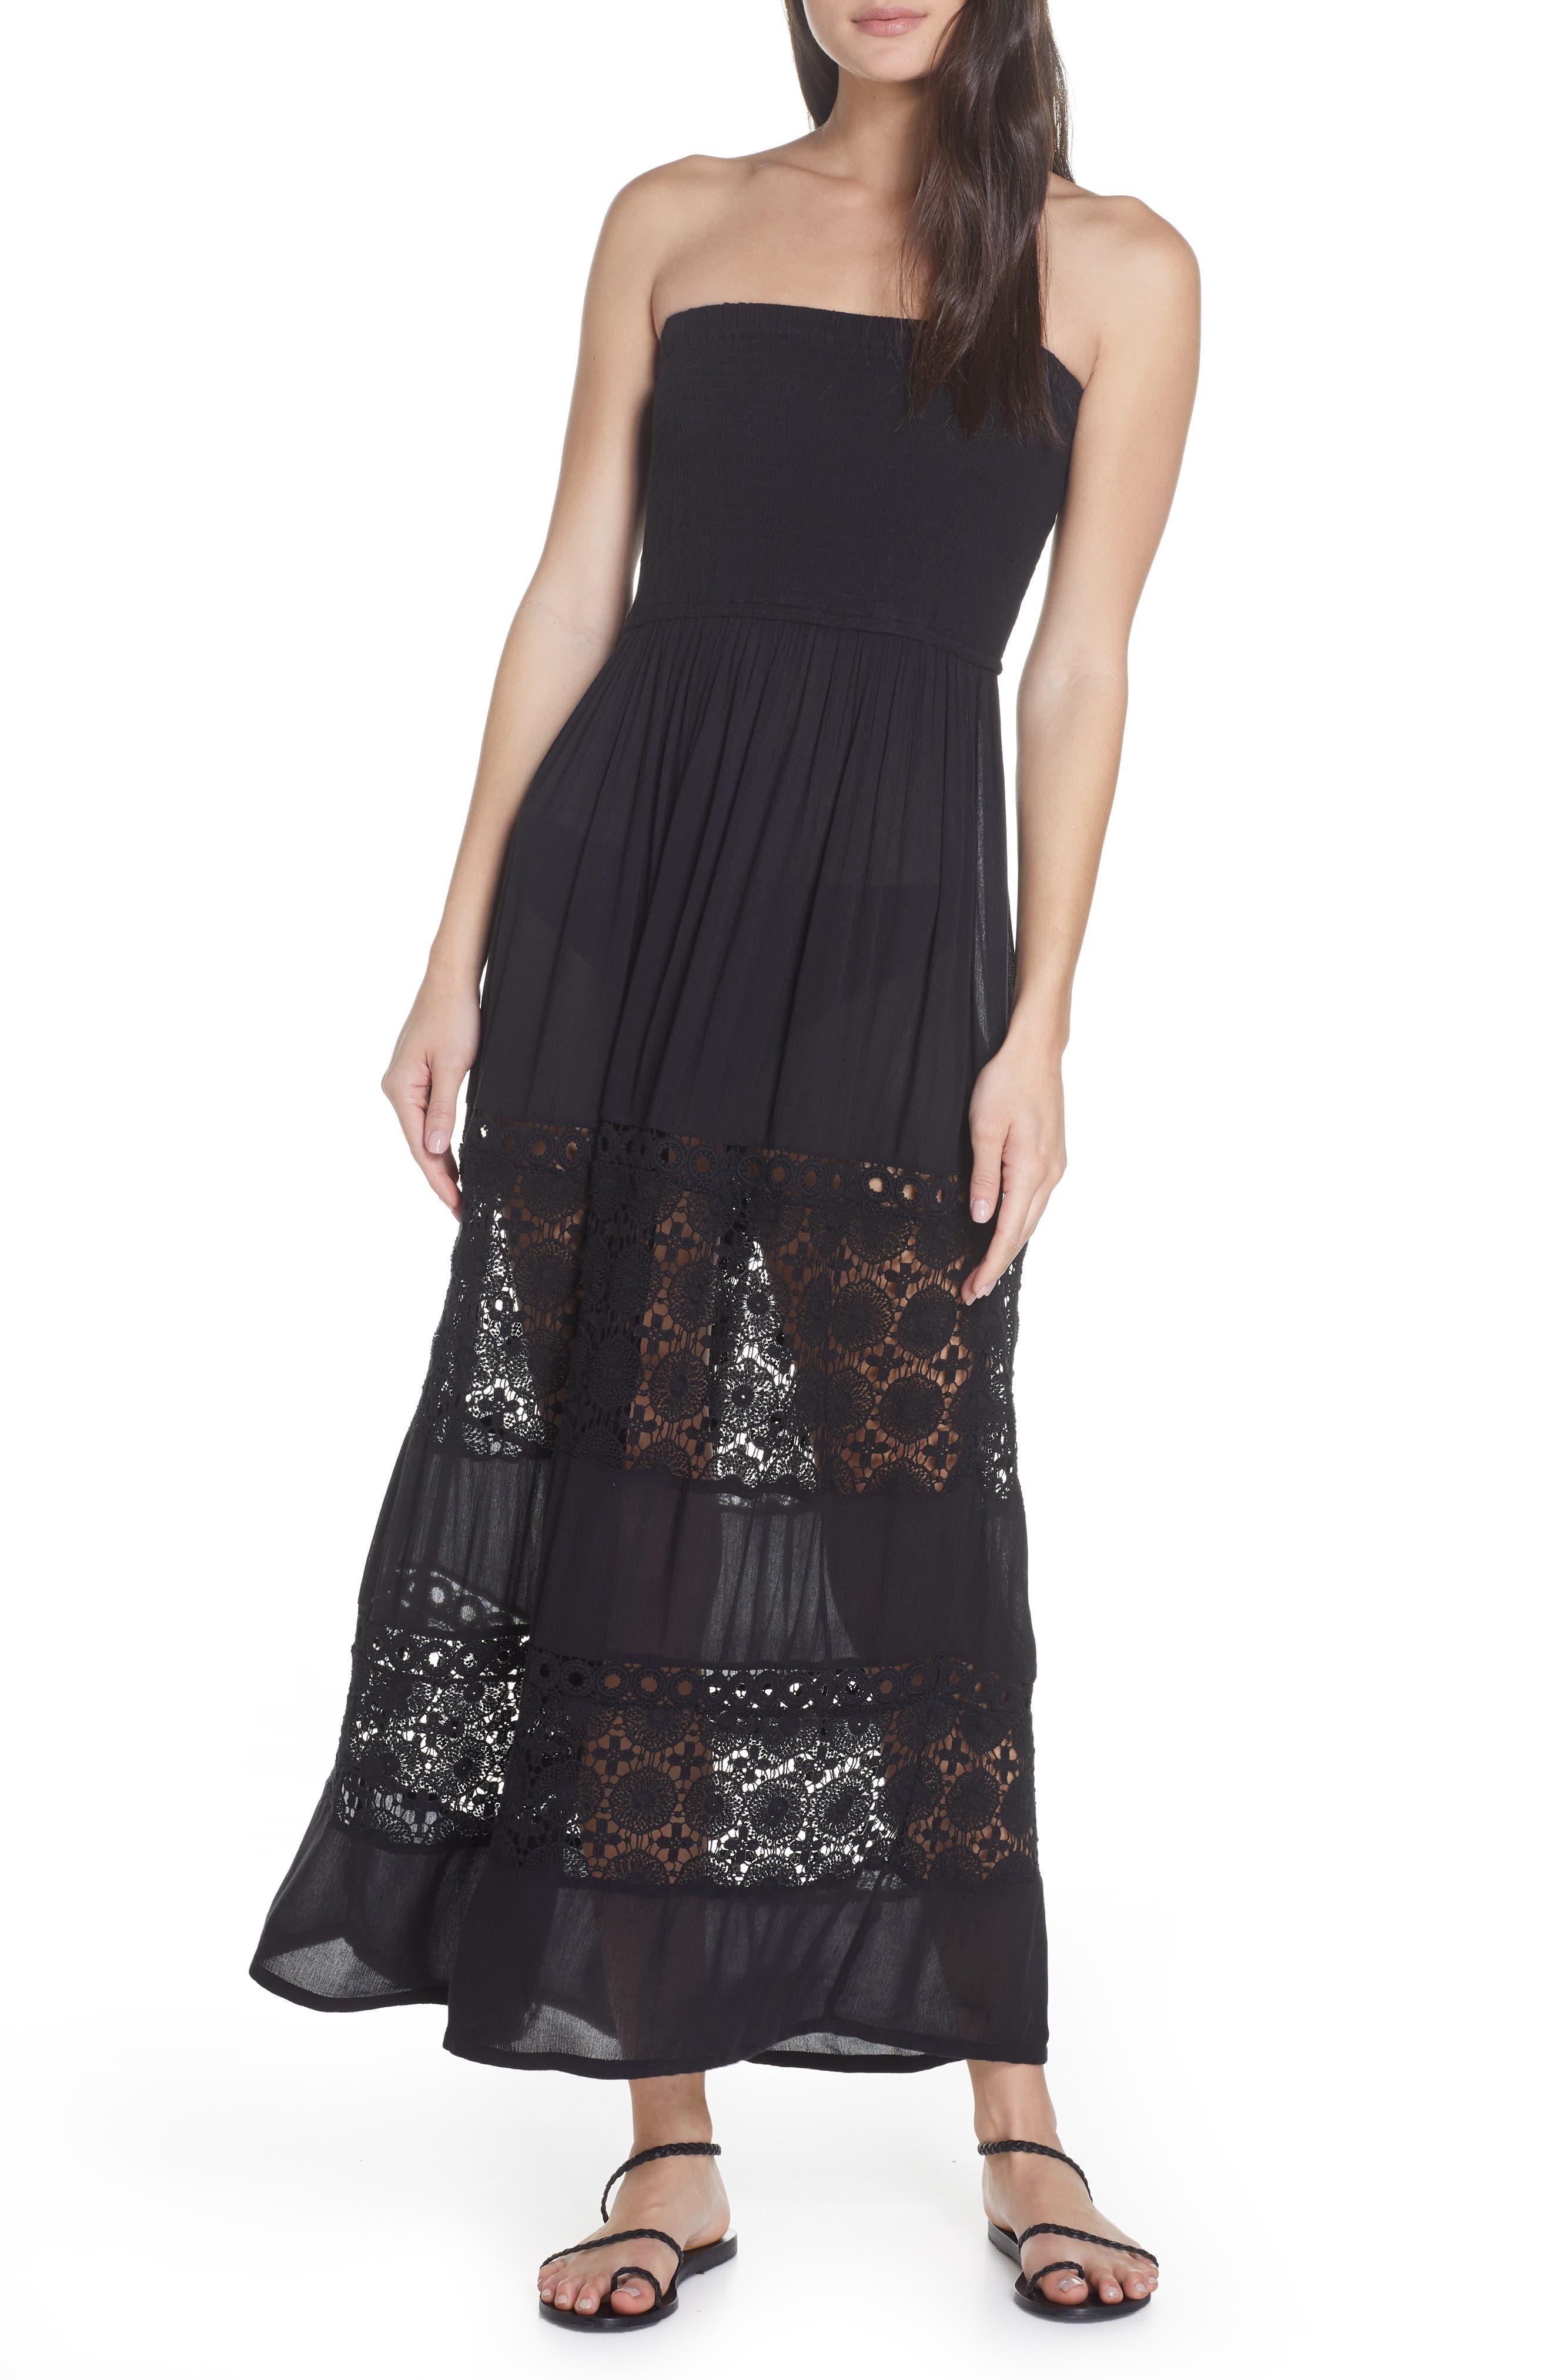 CHELSEA28, Farrah Smocked Cover-Up Maxi Dress, Main thumbnail 1, color, BLACK